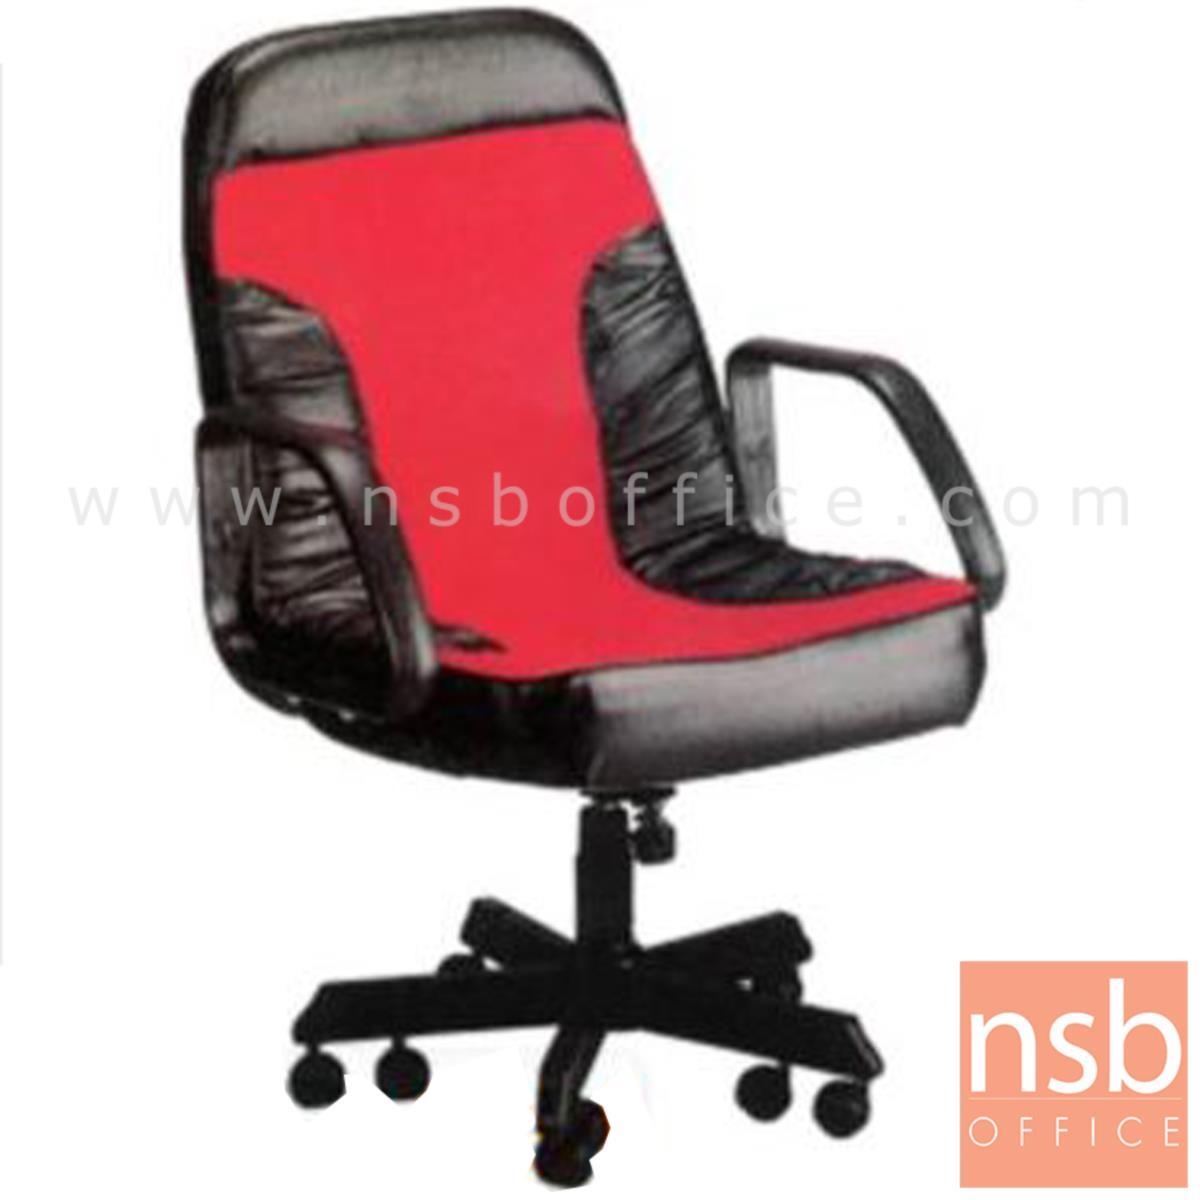 B14A012:เก้าอี้สำนักงาน รุ่น Revenge  ขาเหล็ก 10 ล้อ